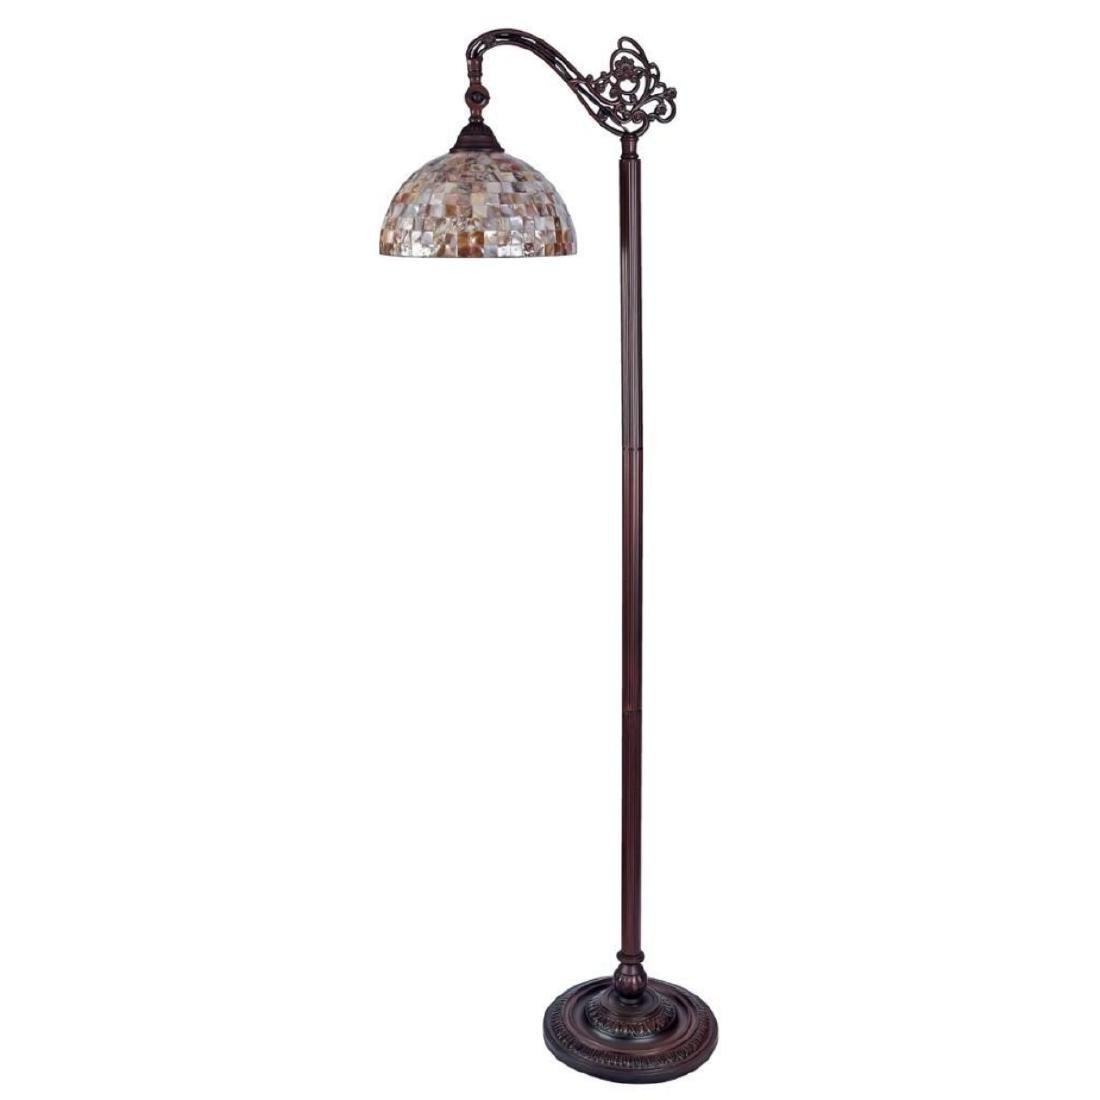 Tiffany-style Reading Floor Lamp - 3